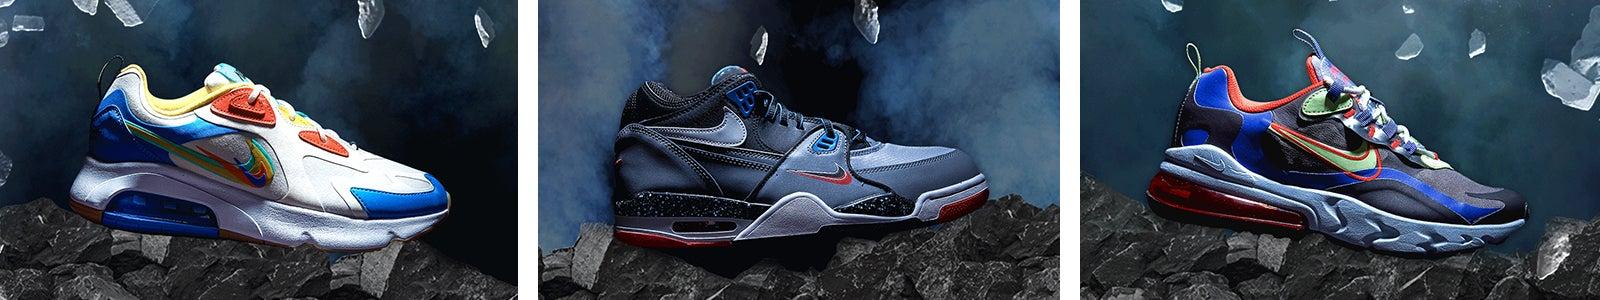 Nike Air Max 97 Sneaker (Women) Nordstrom